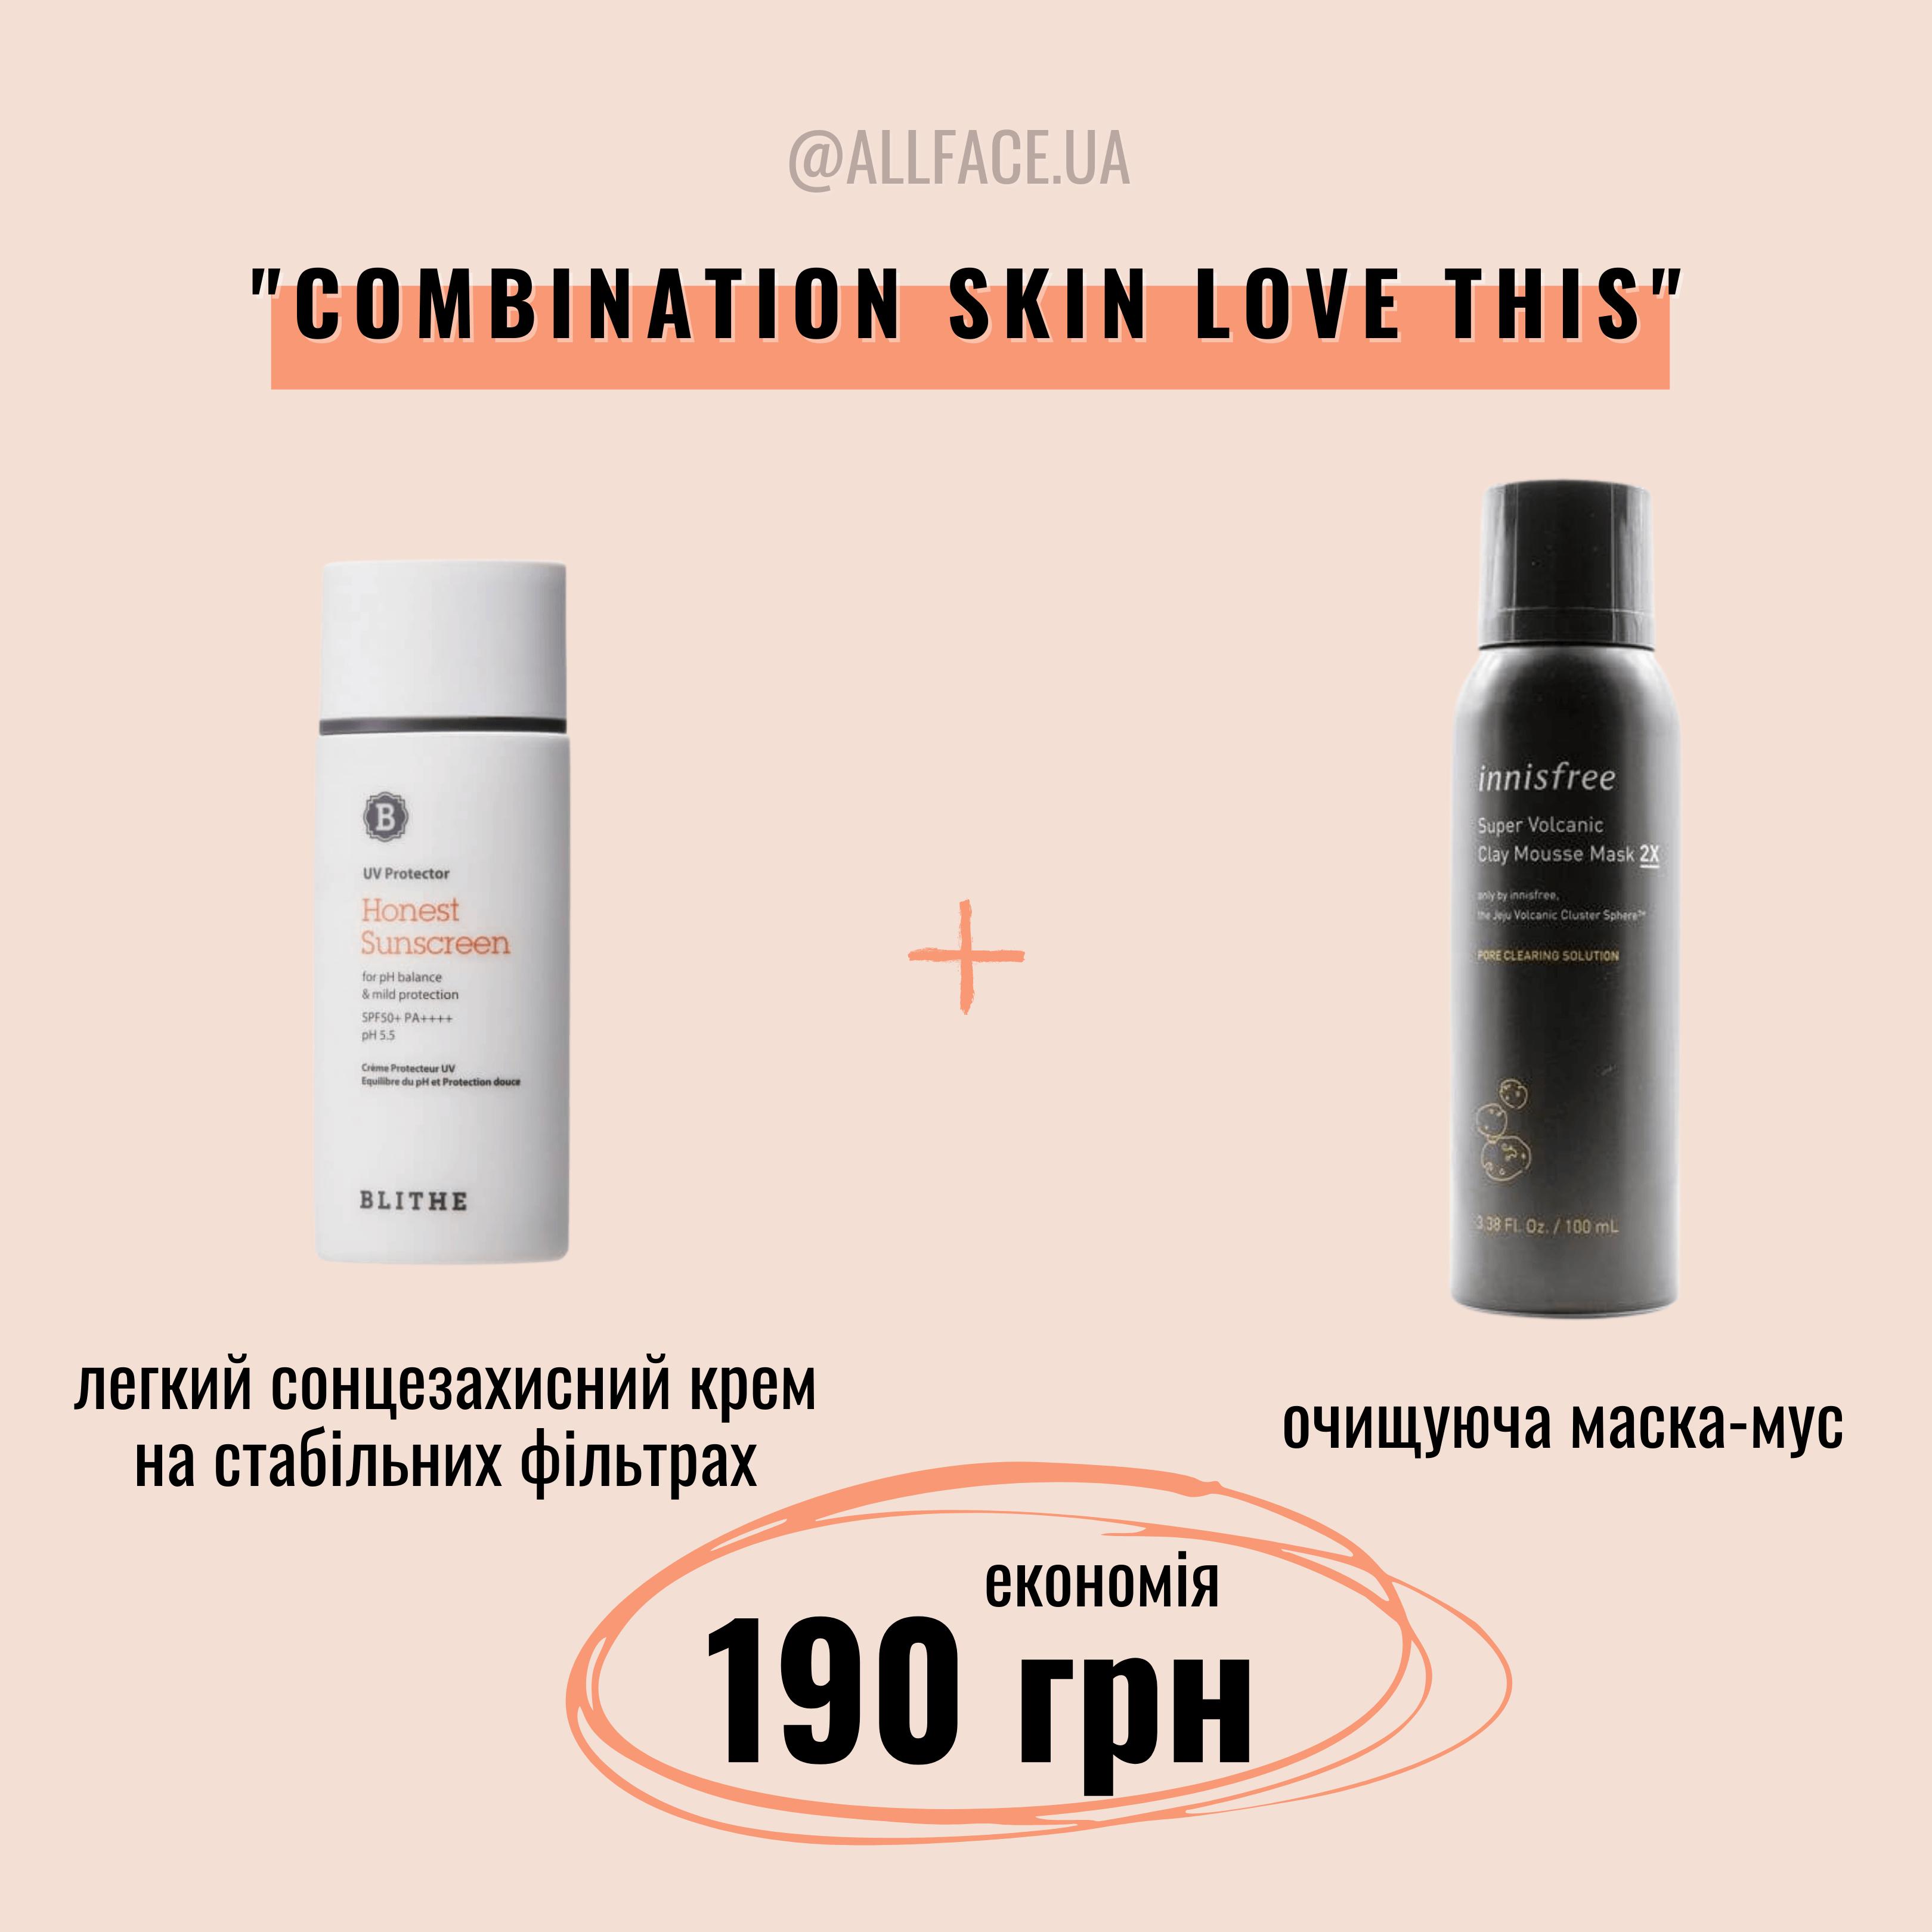 "Сет ""Combination Skin Love This"" сонцезахисний крем Blithe і маска-мус Innisfree"